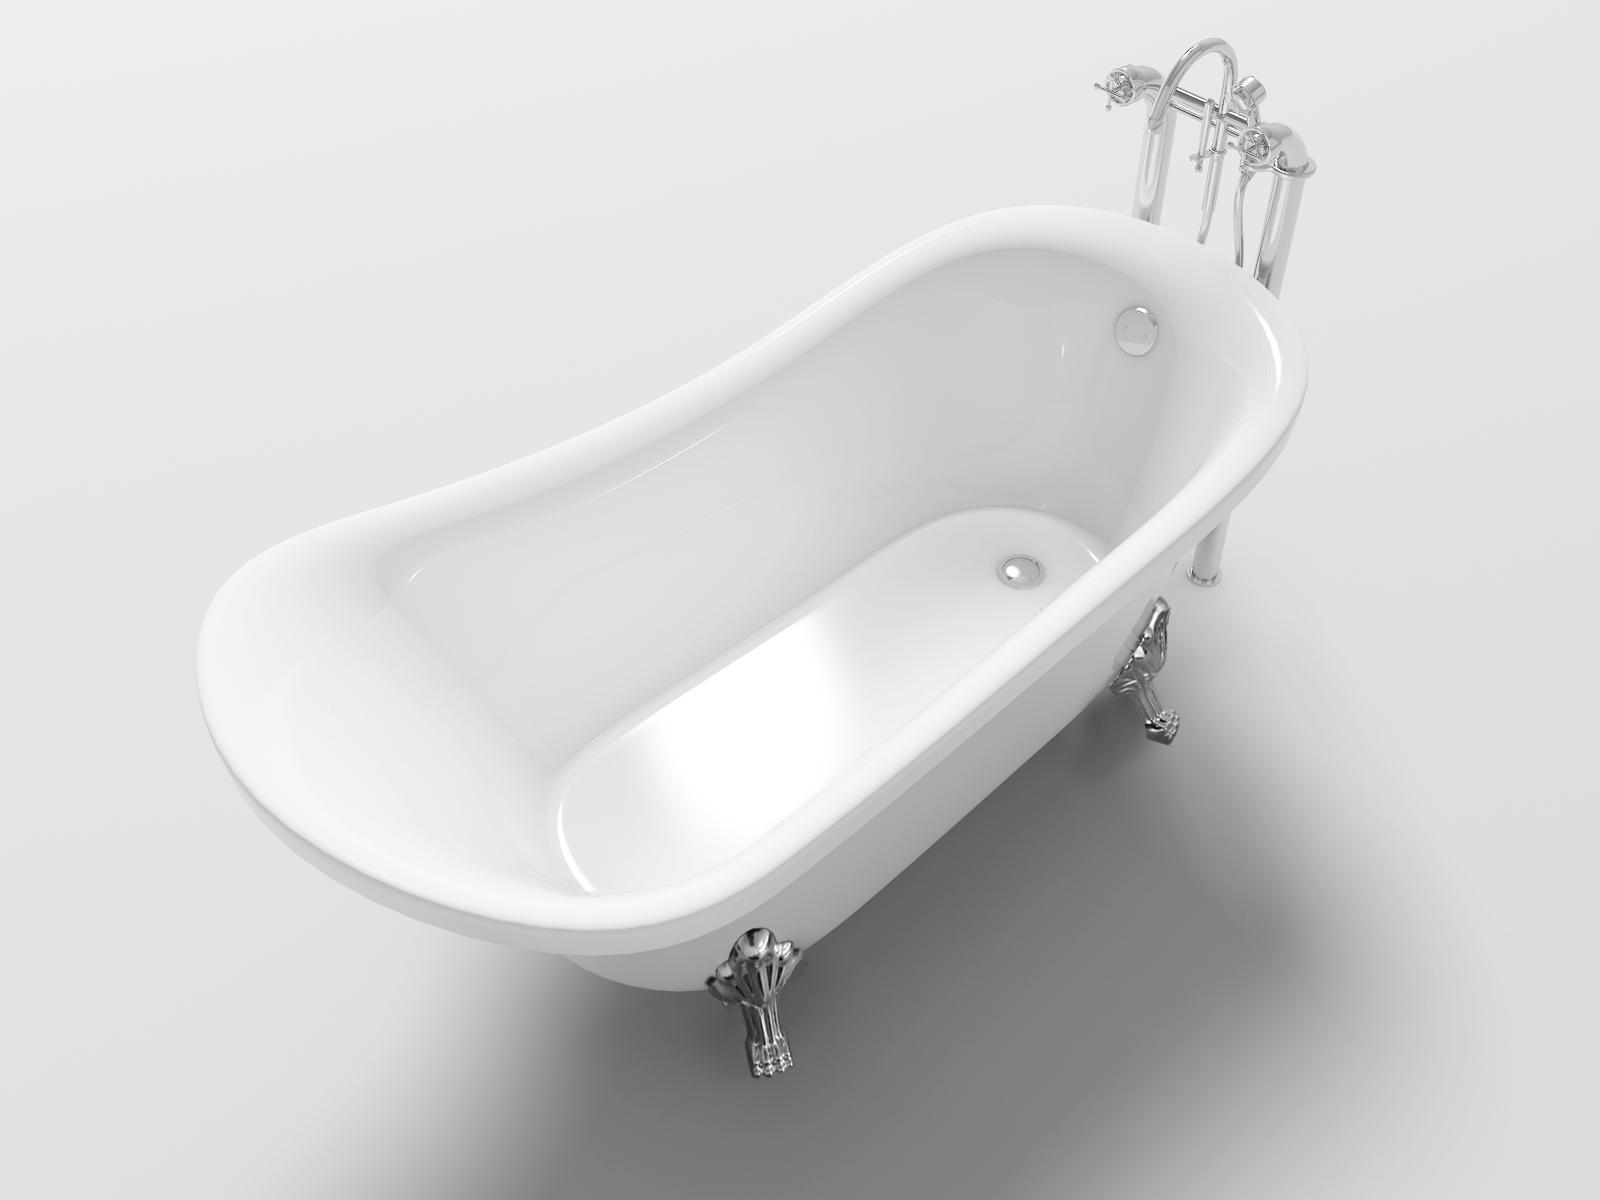 Vasca Da Bagno Stile Inglese : Mitepek.it vasca da bagno in stile inglese freestanding